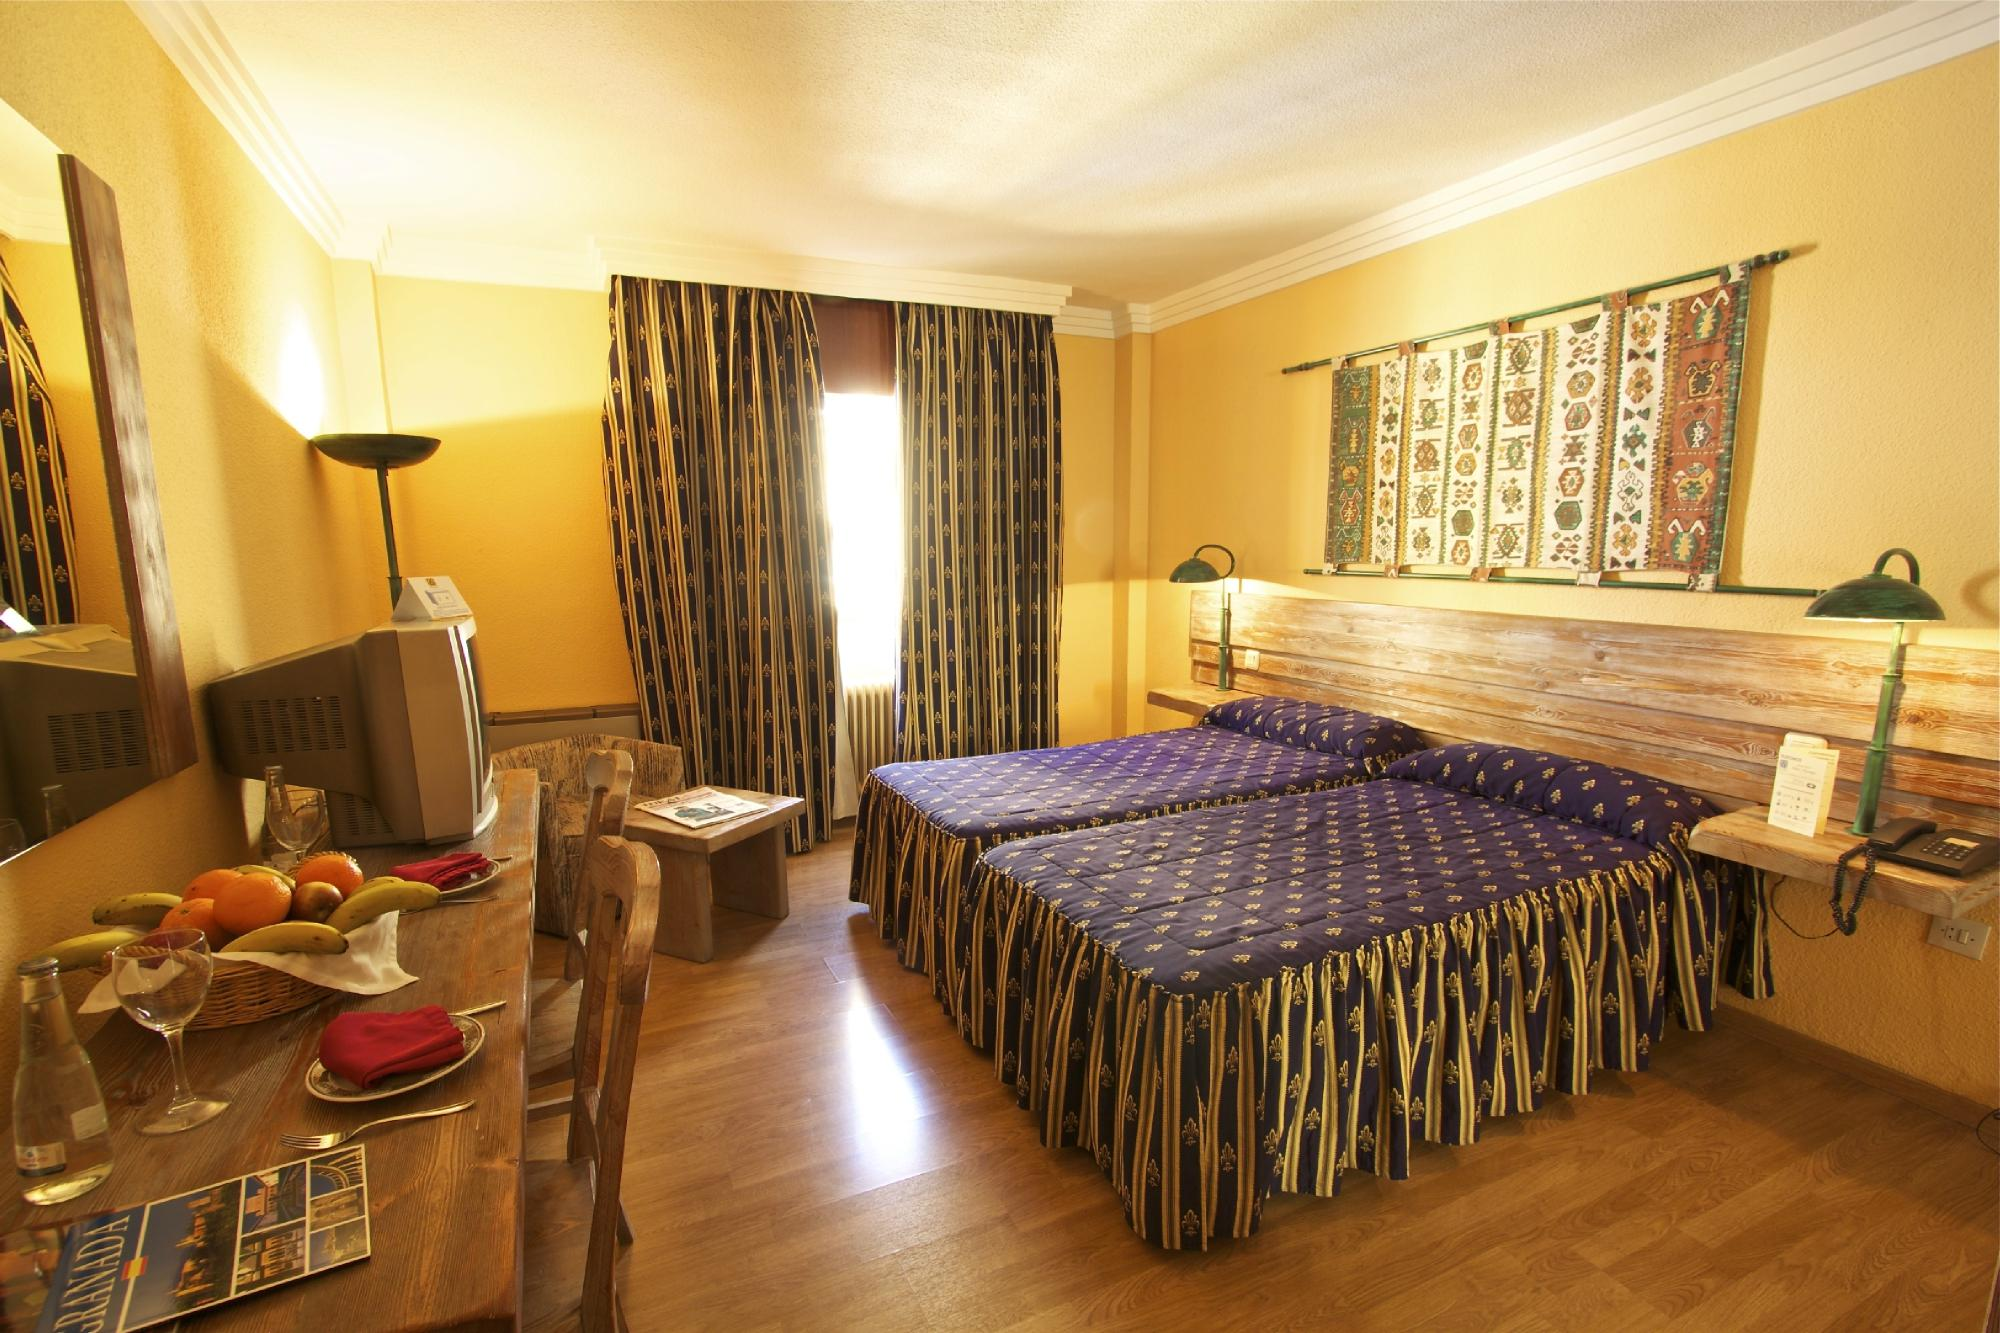 Aben Humeya Hotel